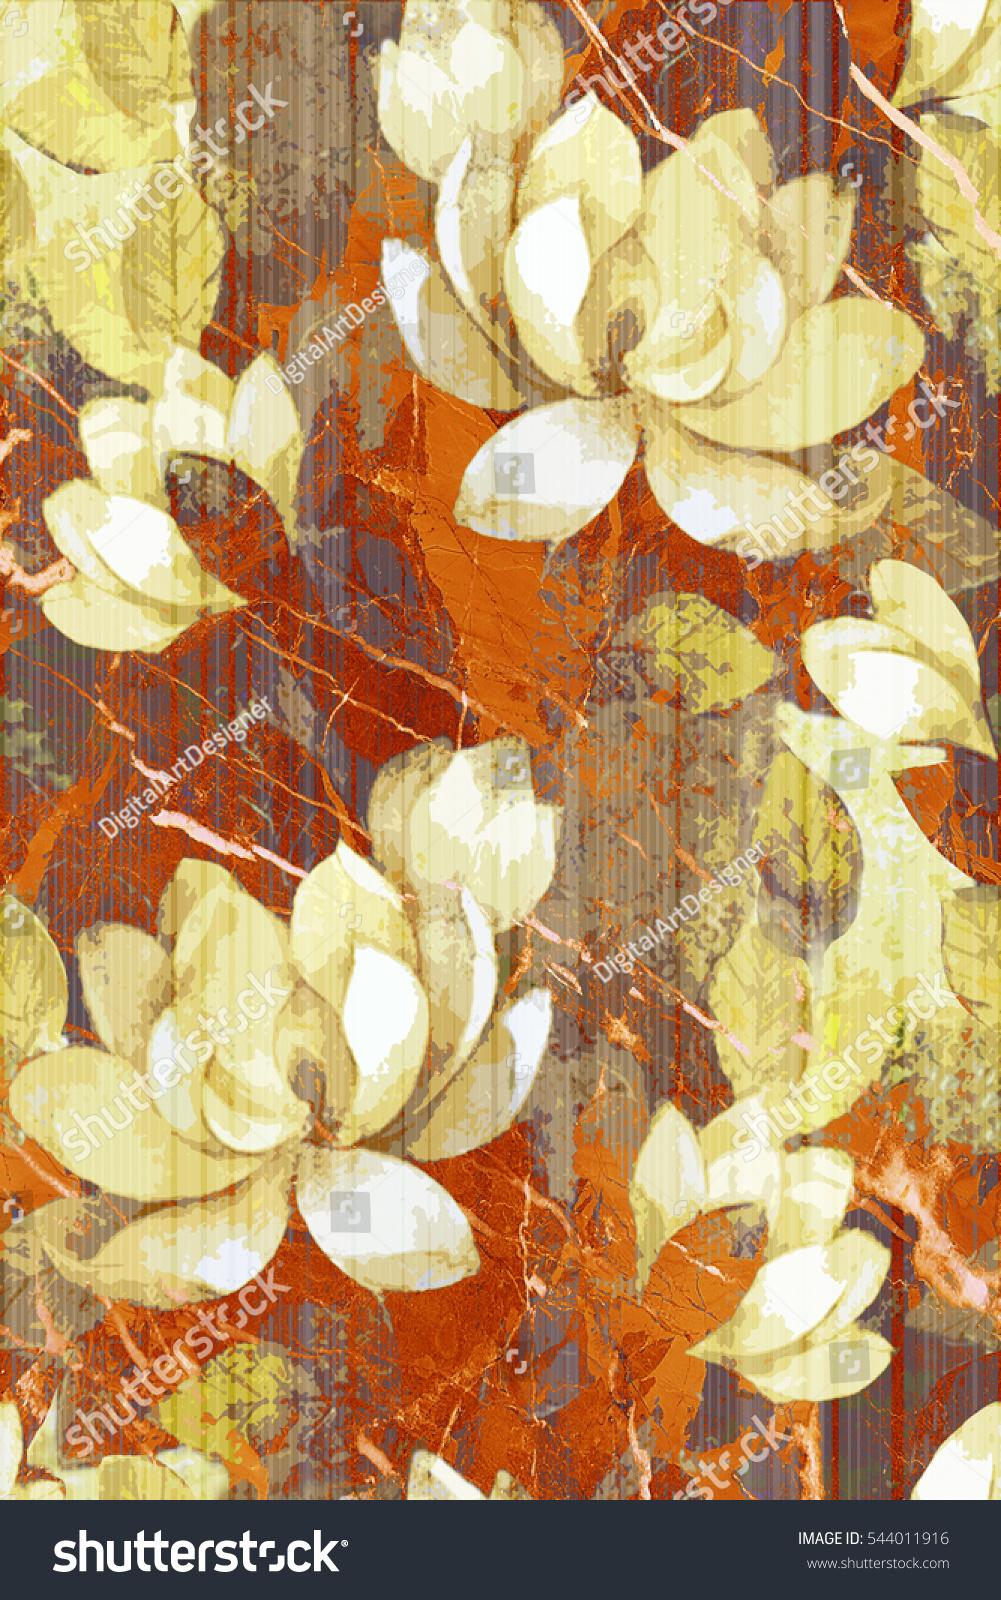 Colorful Vintage Ceramic Tiles Wall Decoration Digital Stock ...